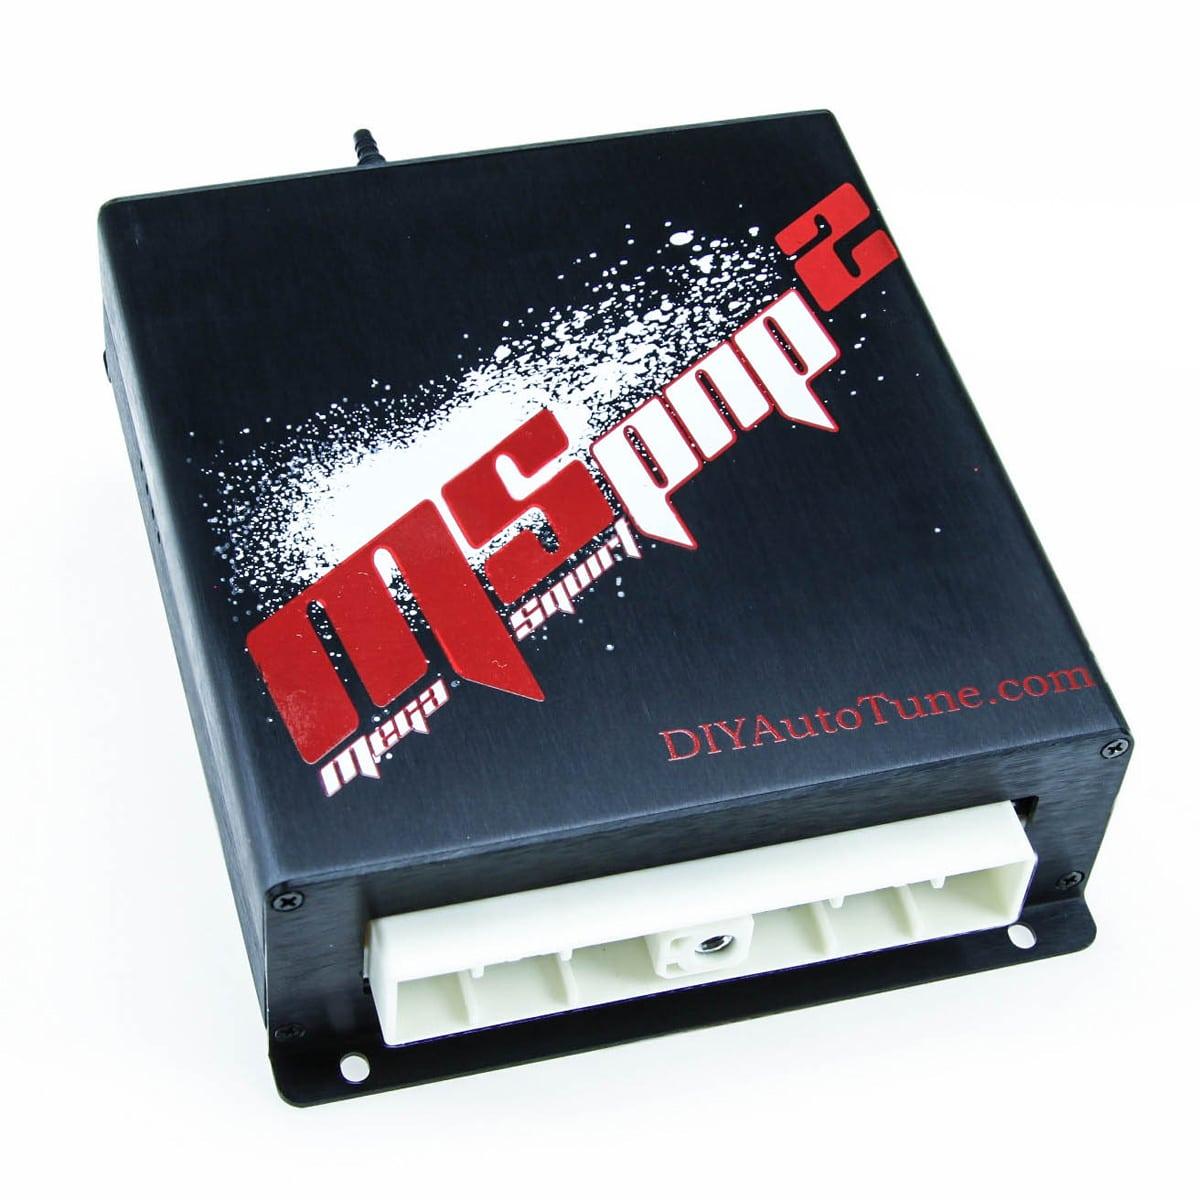 MegaSquirtPNP G2 NS9501a for the 1995 Nissan 240SX - Manual Trans